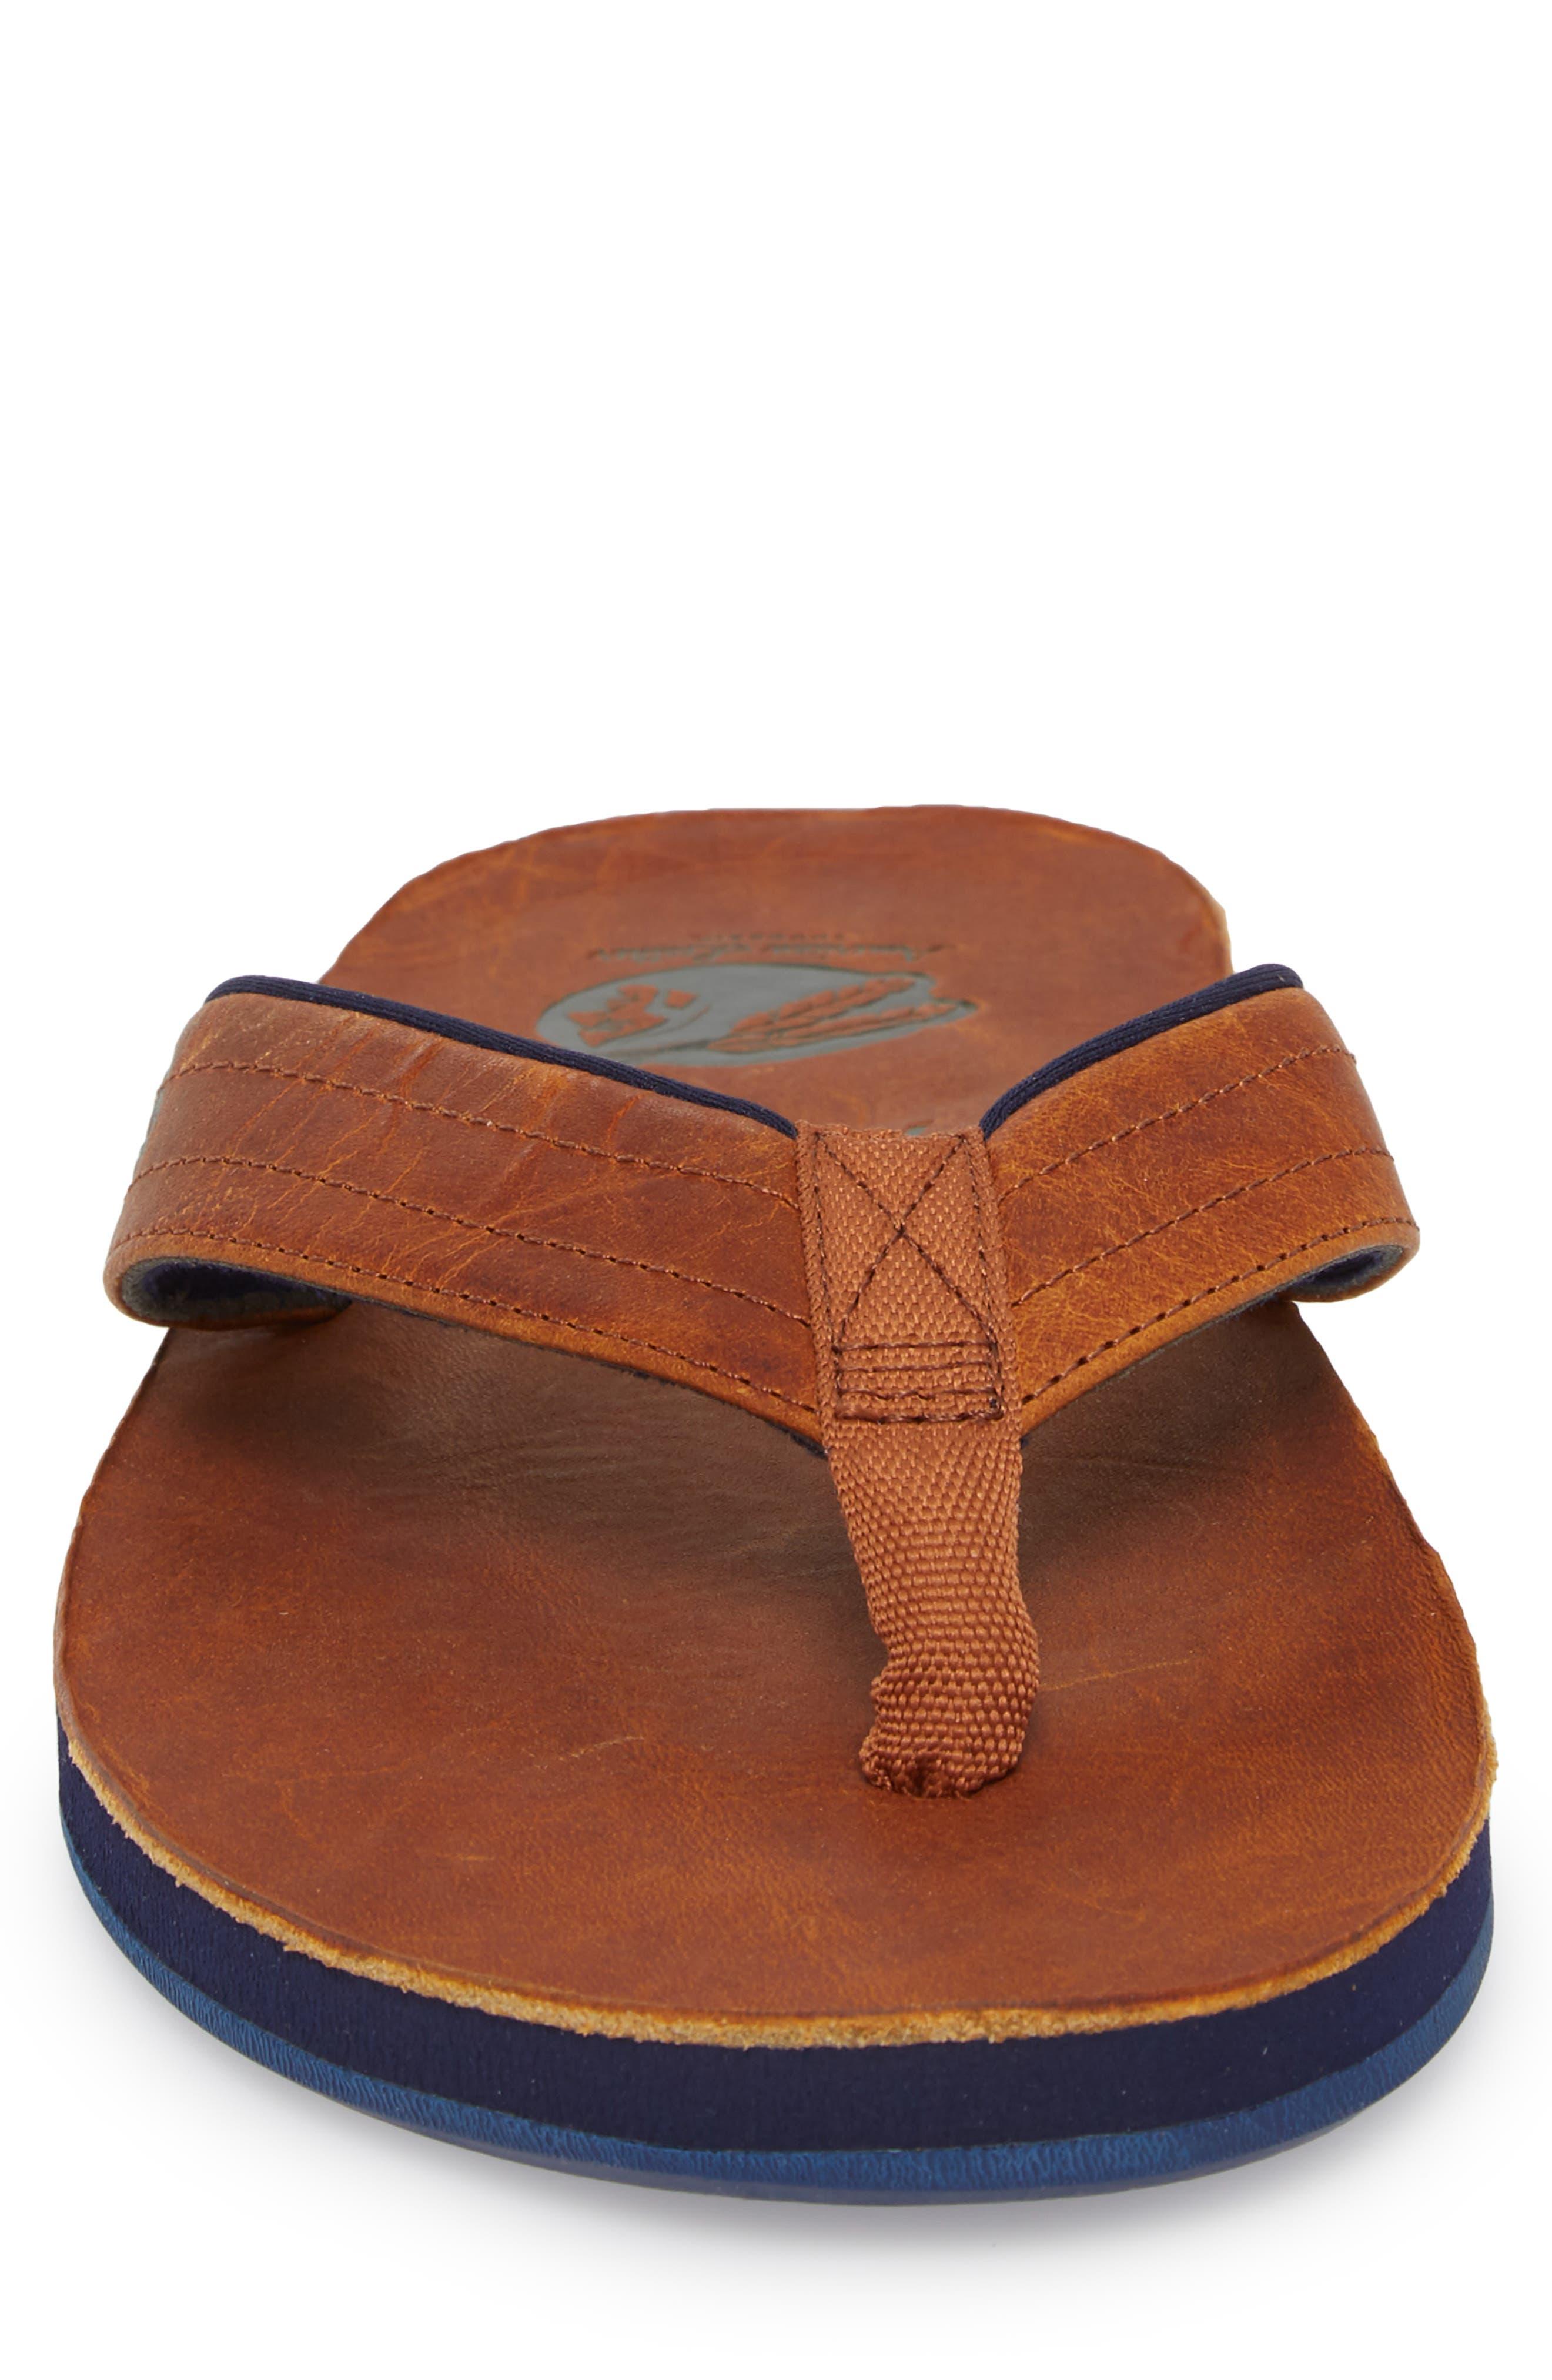 Nokona Flip Flop,                             Alternate thumbnail 4, color,                             Generation Brown Leather